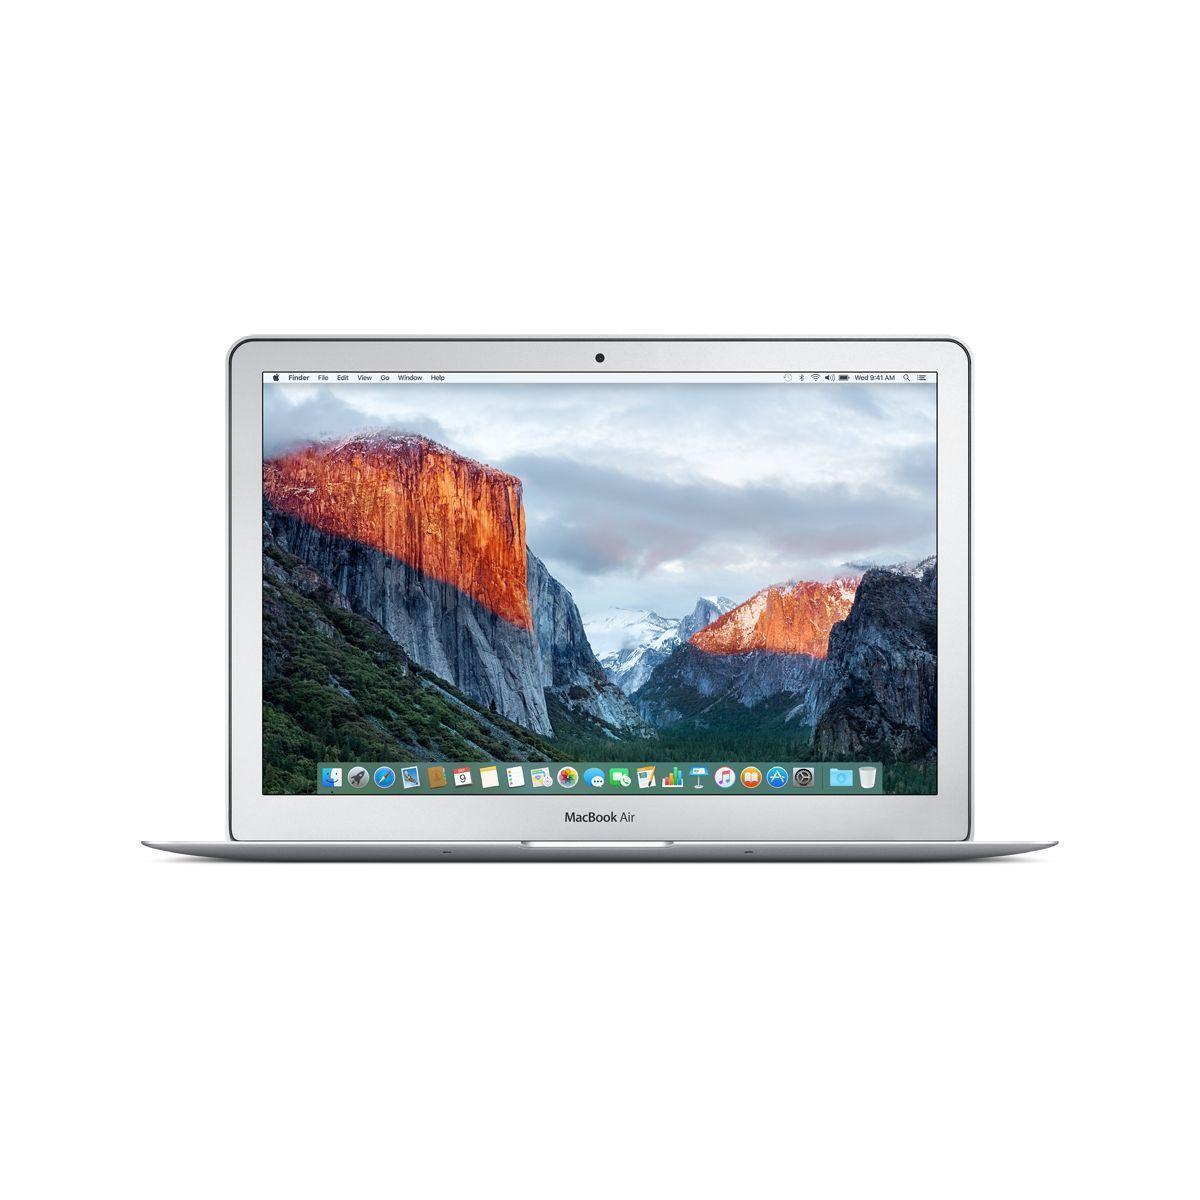 Macbook Air 13 Early 2015 Core I7 Ram 8gb 256 Gb Ssd Refurbished Macbook Air Laptop Macbook Air 13 Inch Macbook Air